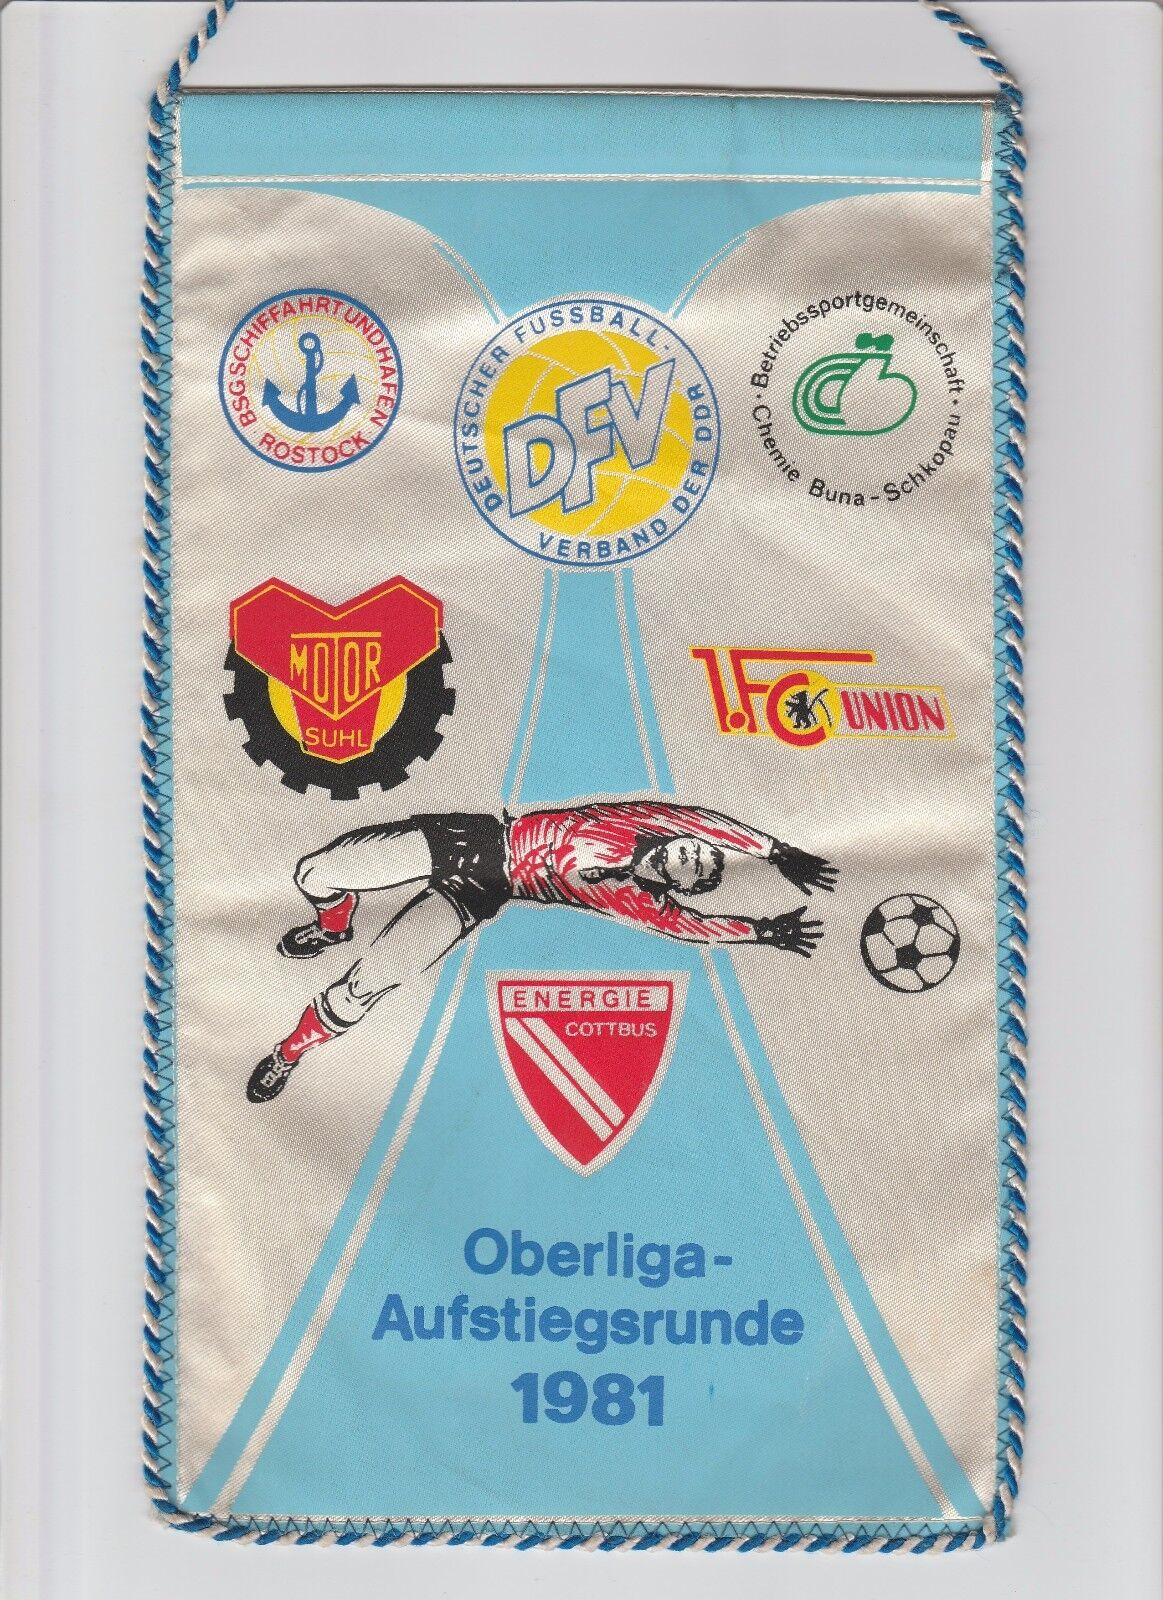 Orig.Wimpel   DDR Oberliga Aufstiegsrunde 1981 - UNION BERLIN MOTOR SUHL COTTBUS  | Zuverlässiger Ruf